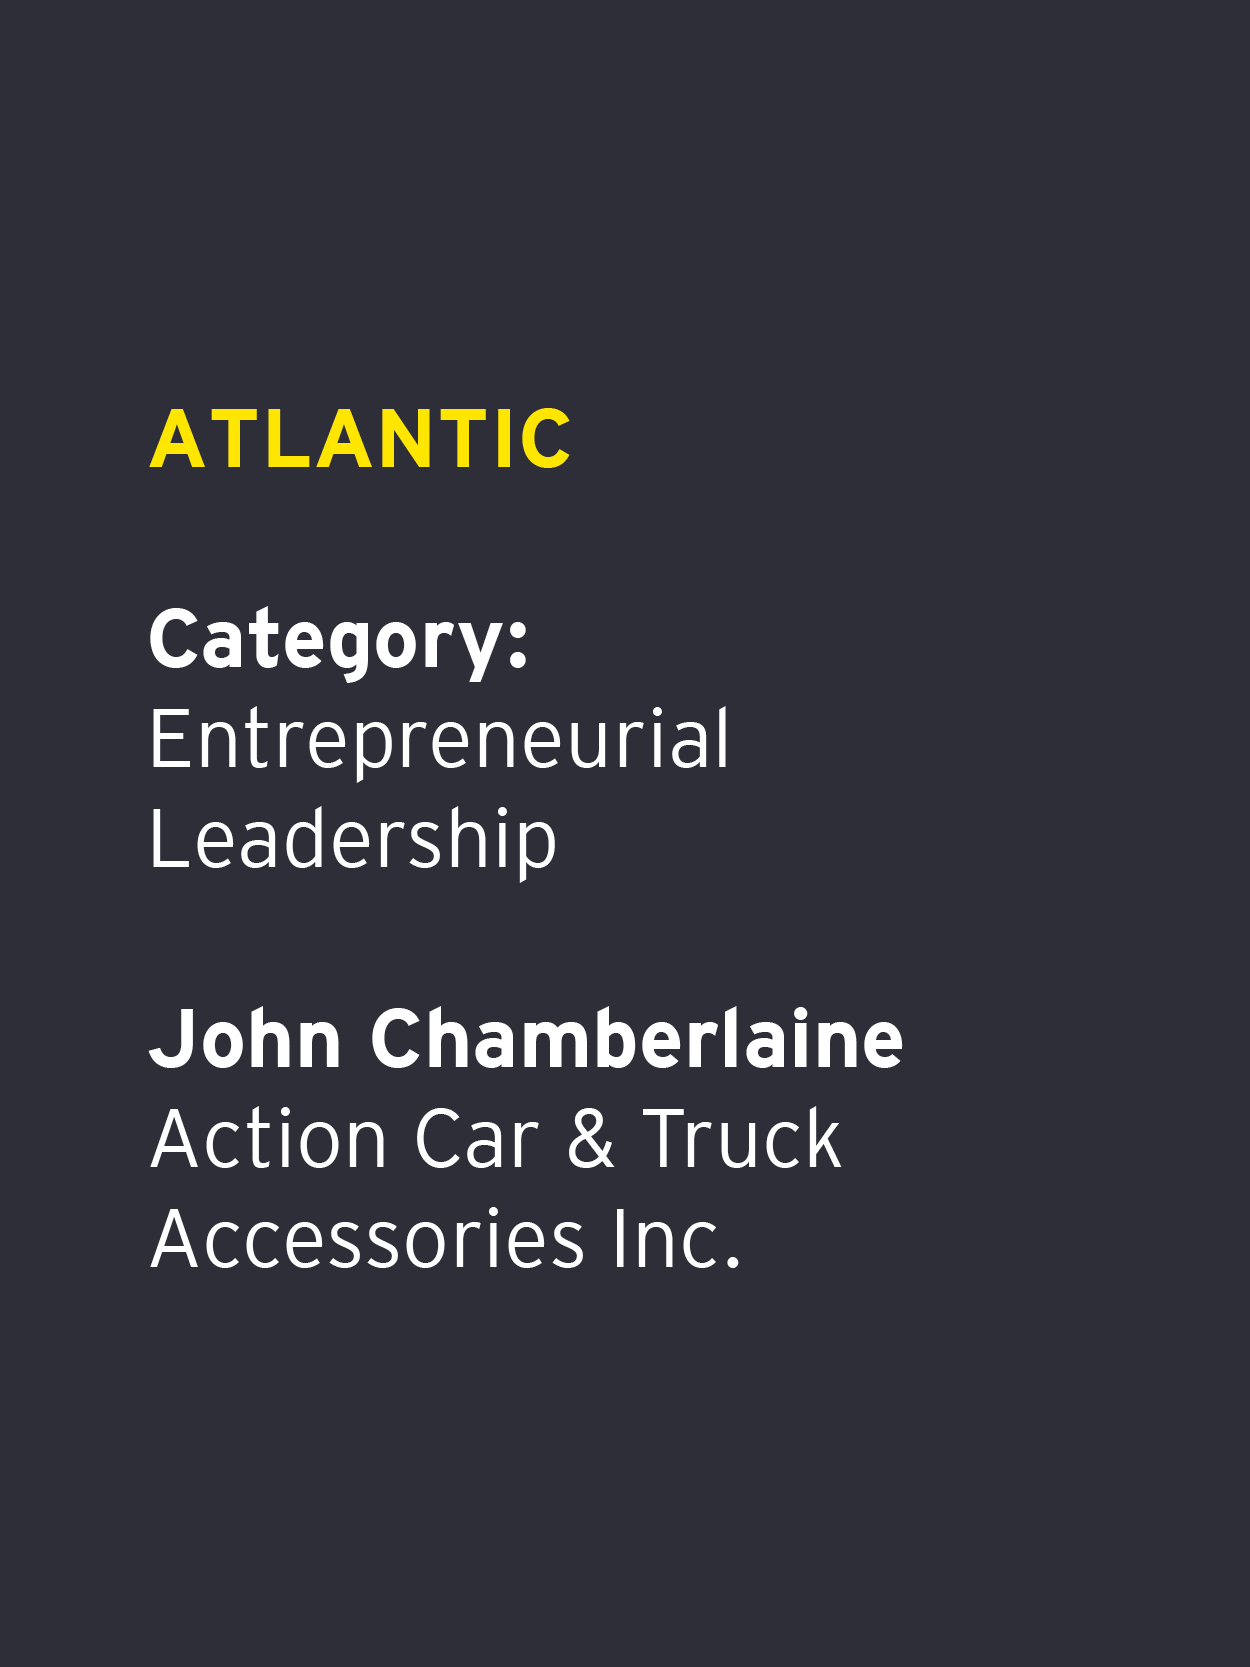 John Chamberlaine - Action Car & Truck Accessories Inc.